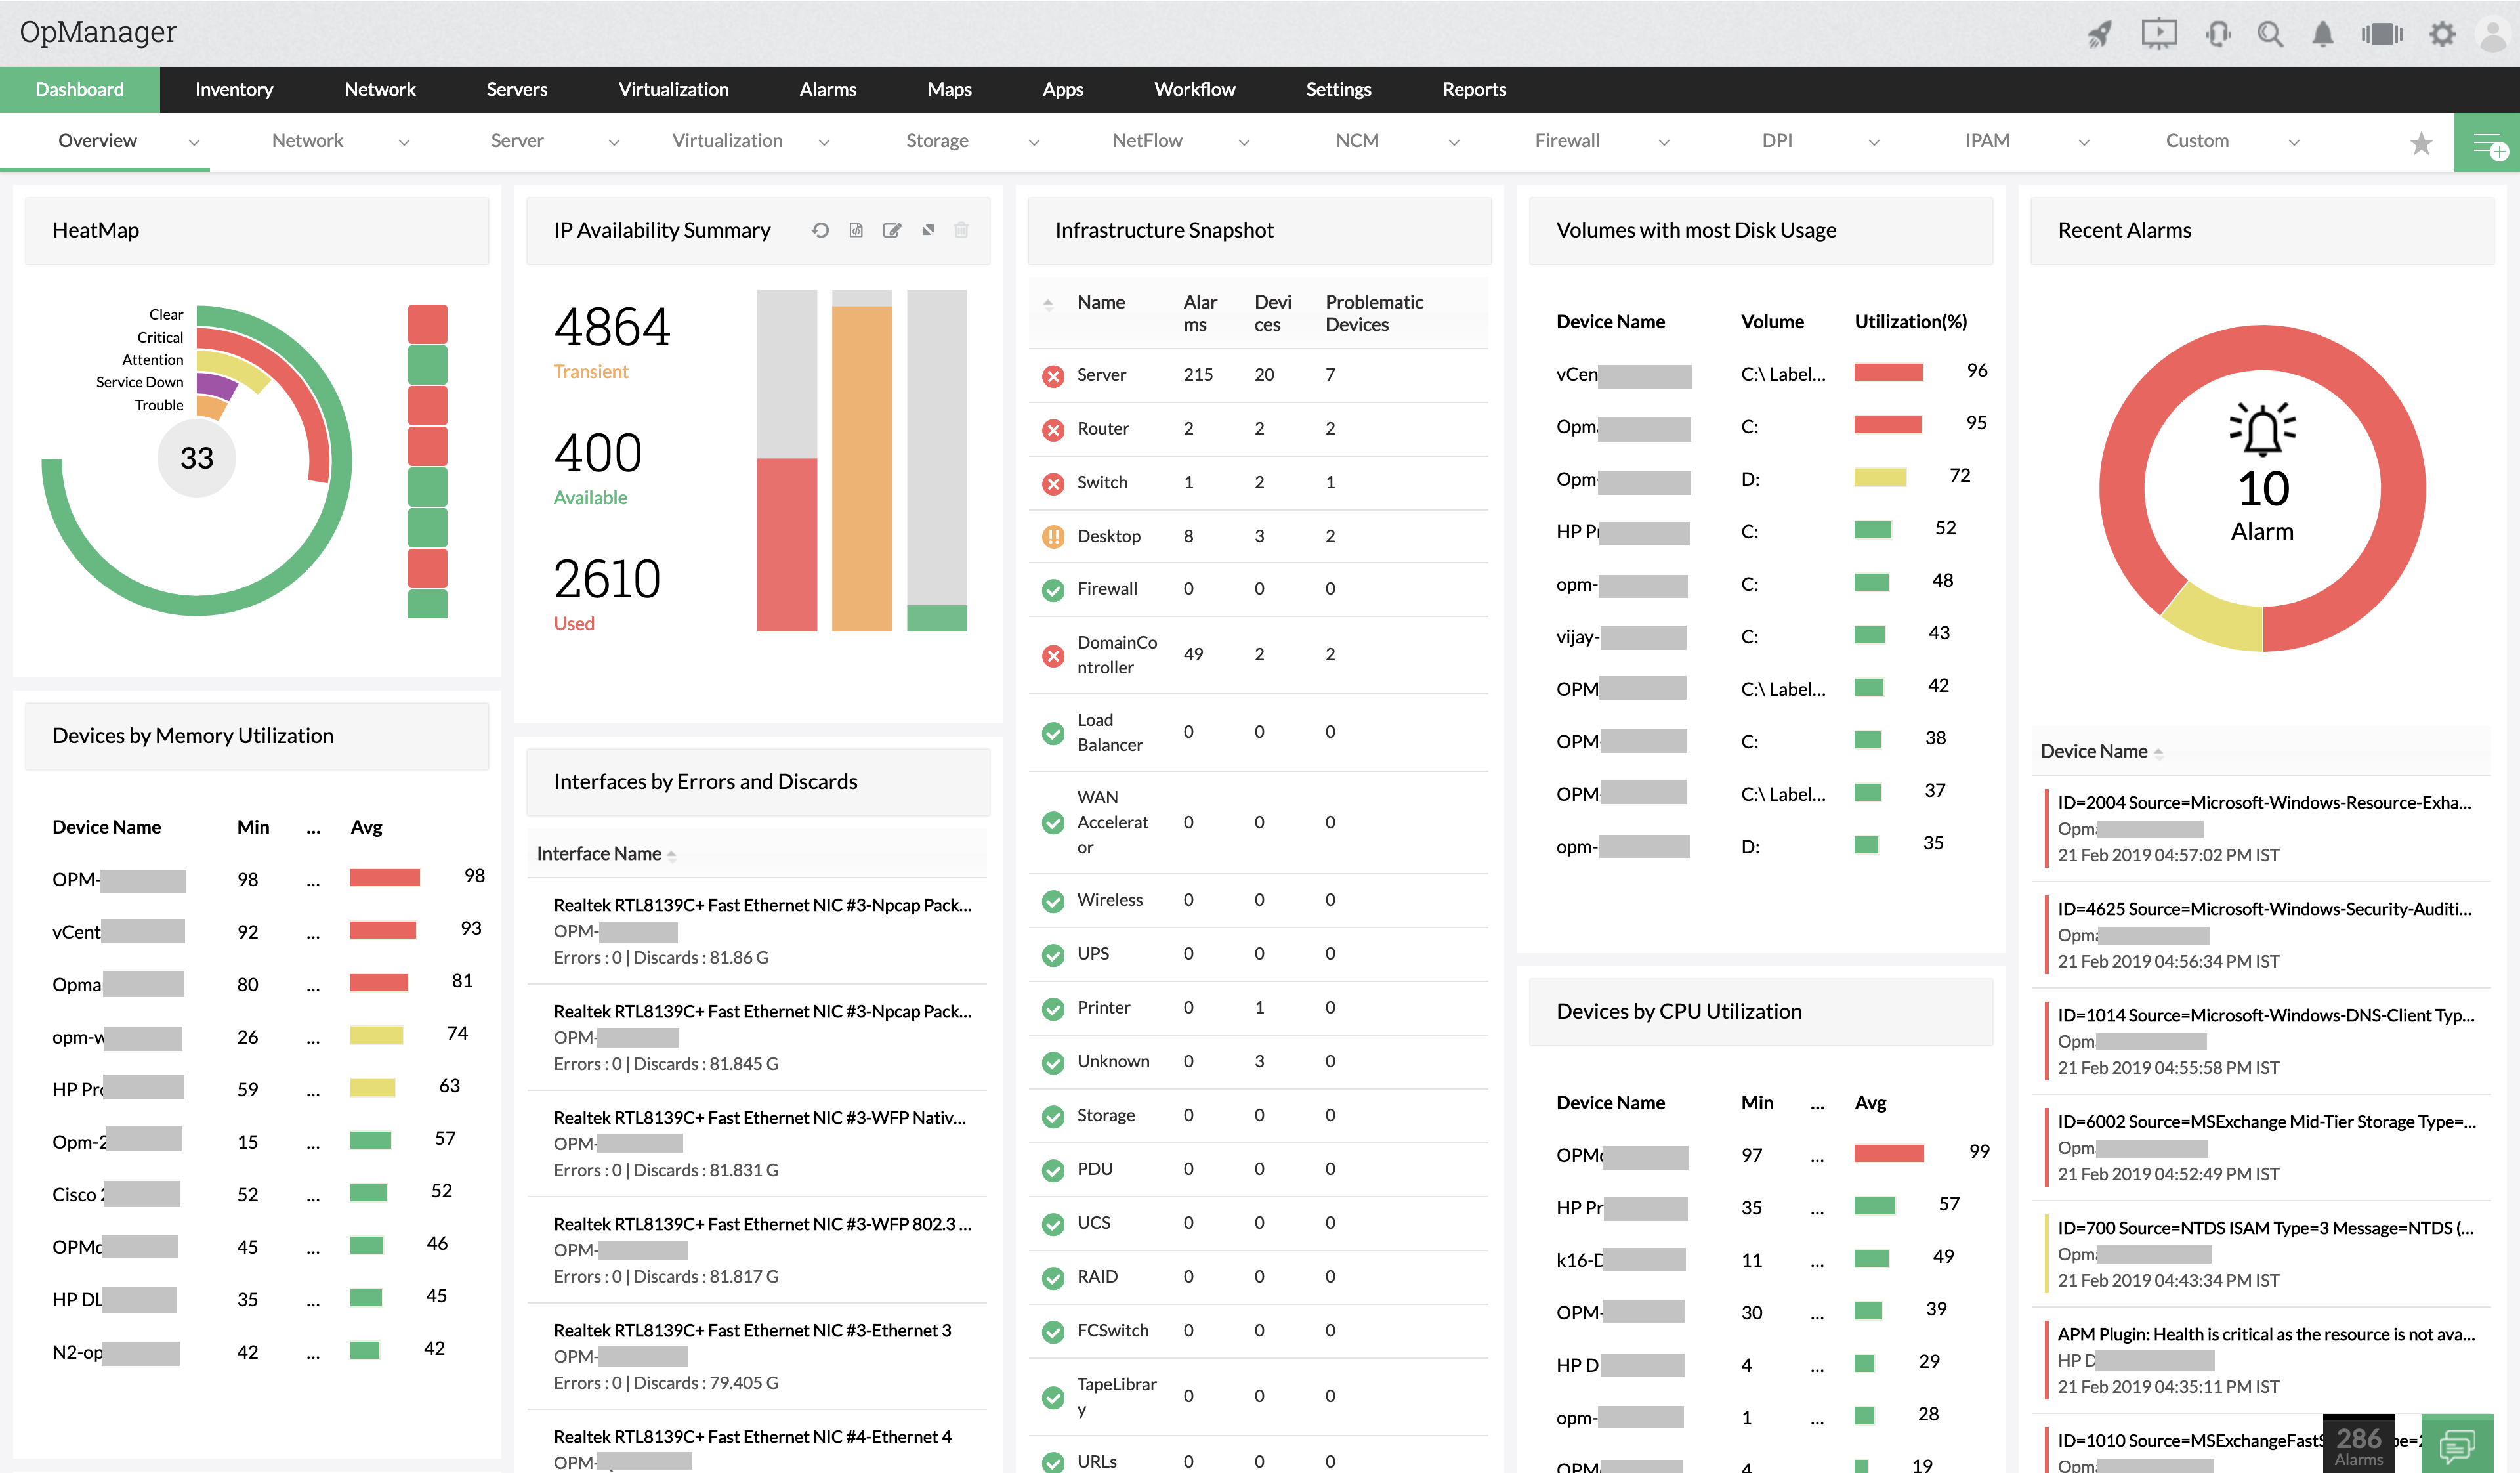 Network Software Dashboard - ManageEngine OpManager